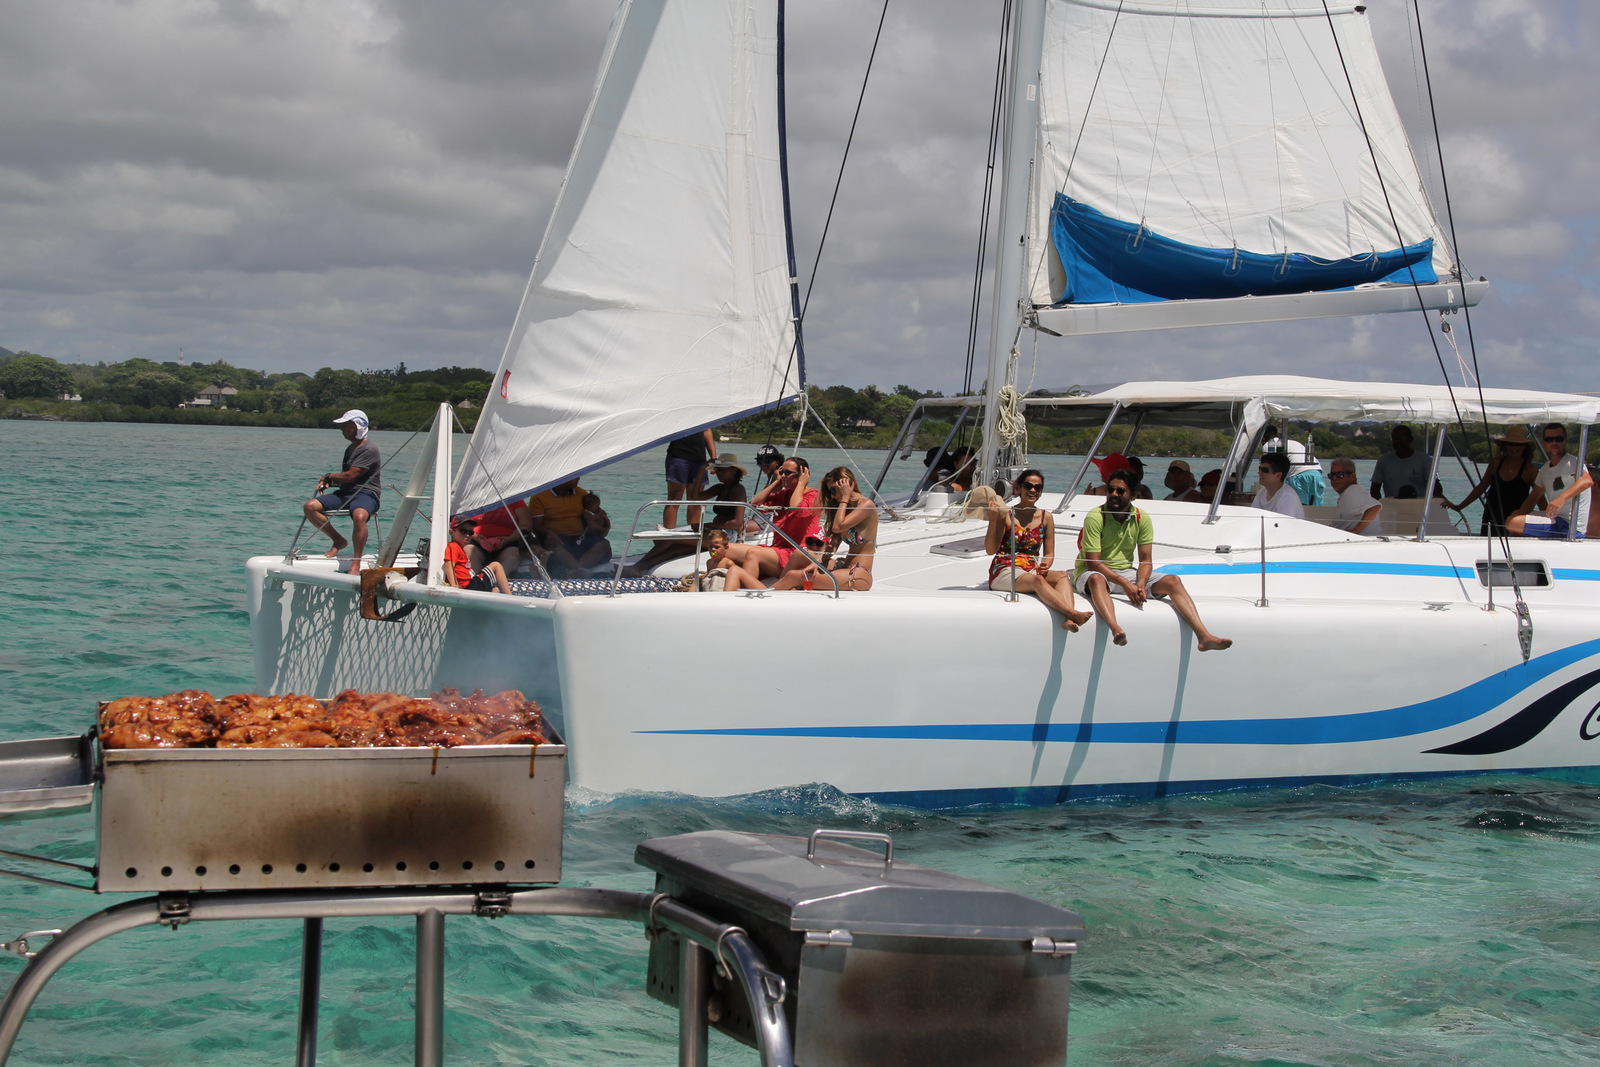 mauritius photos